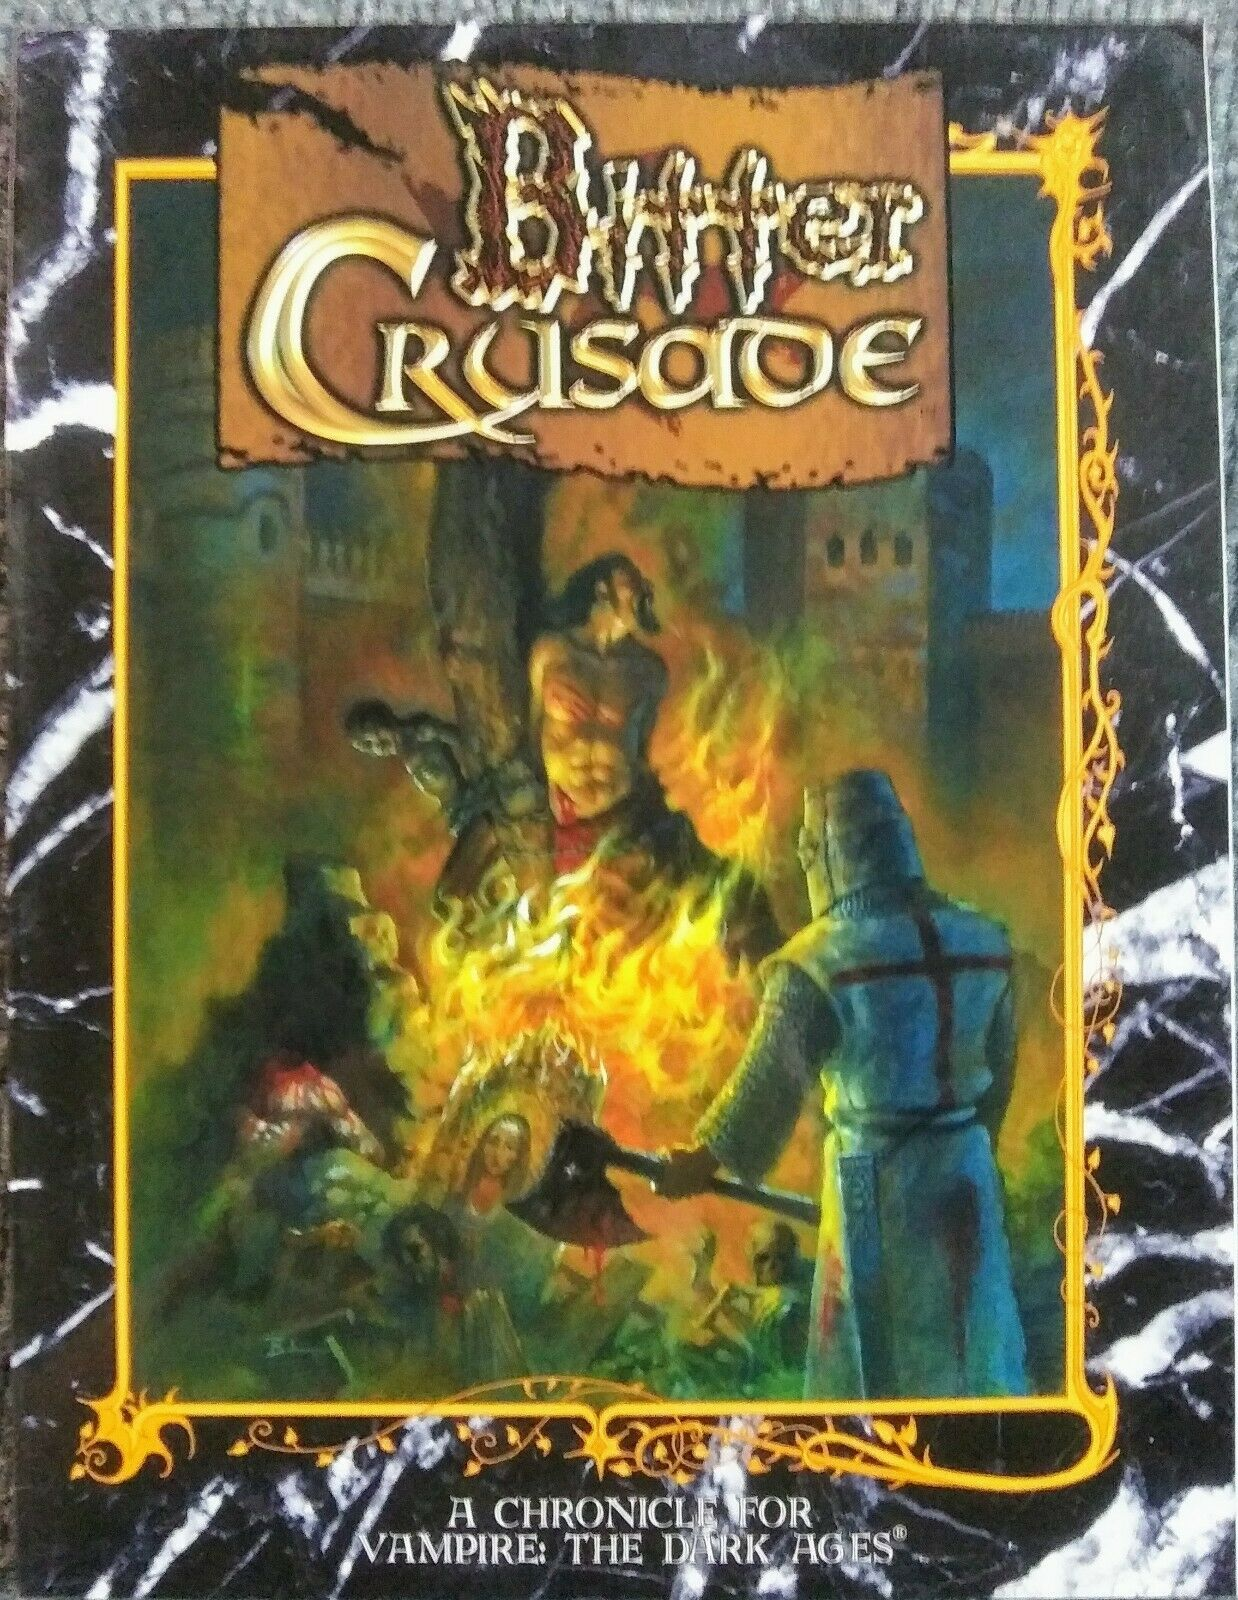 Vampire: The Dark Ages: Bitter Crusade - Used